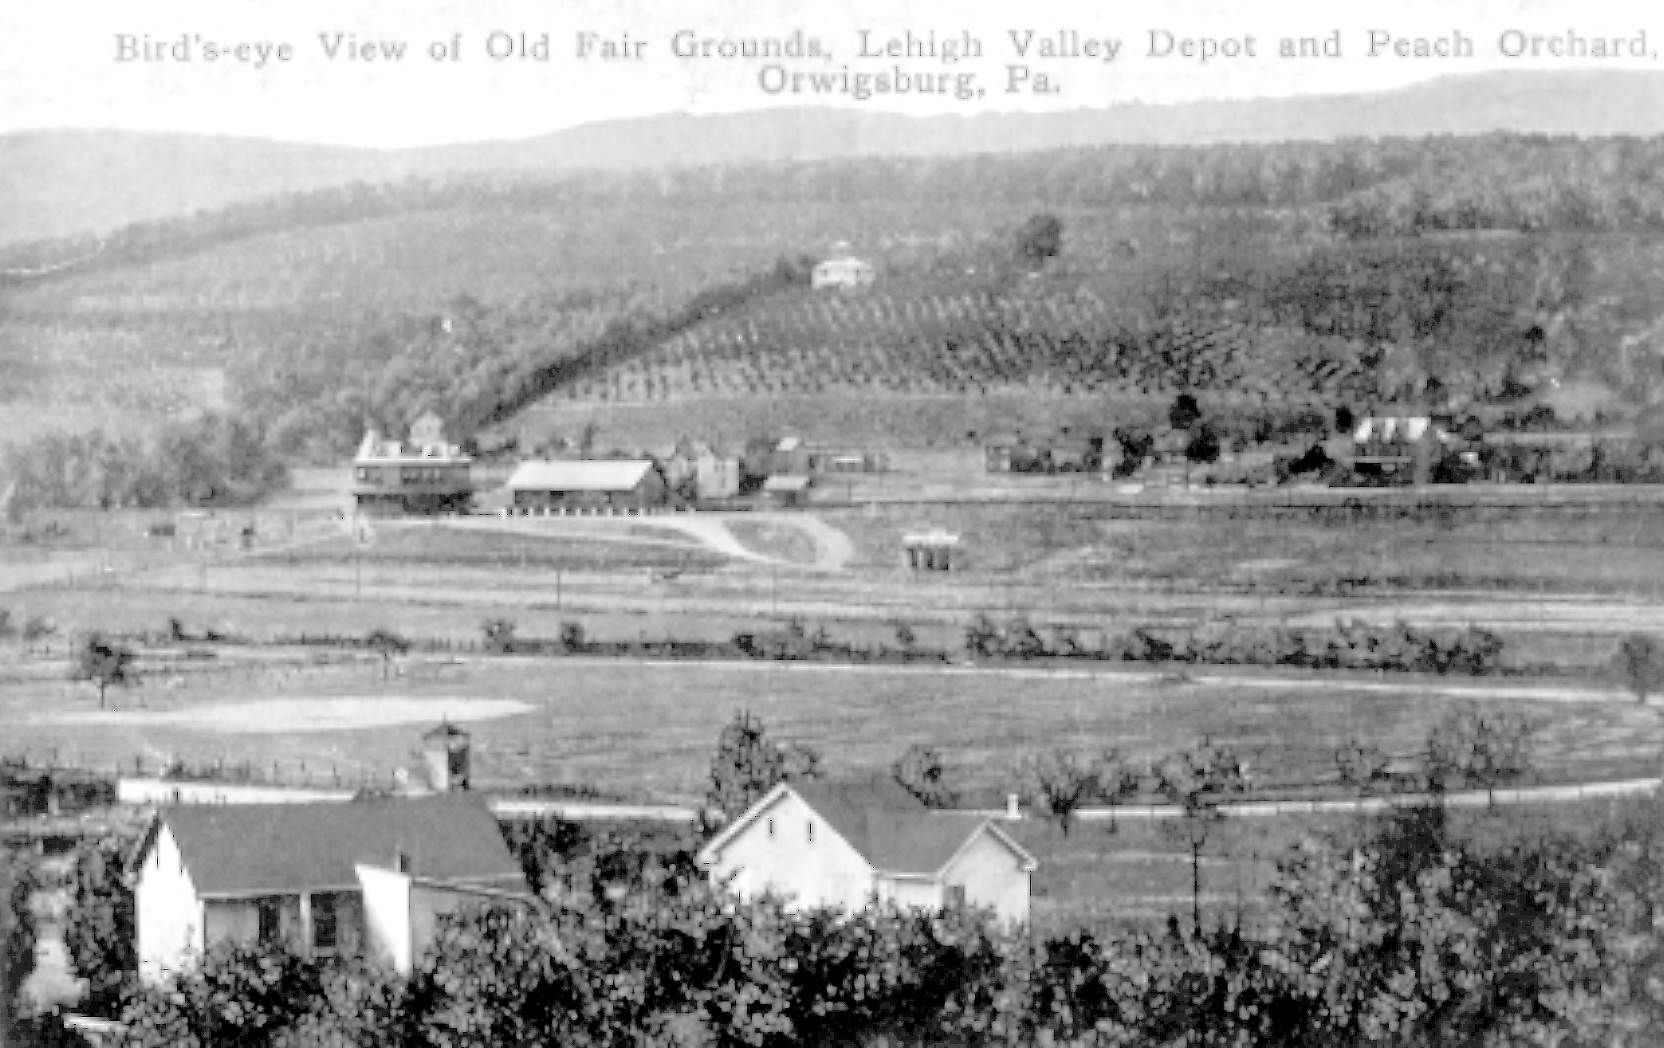 Orwigsburg Pa. Fair Ground Depot